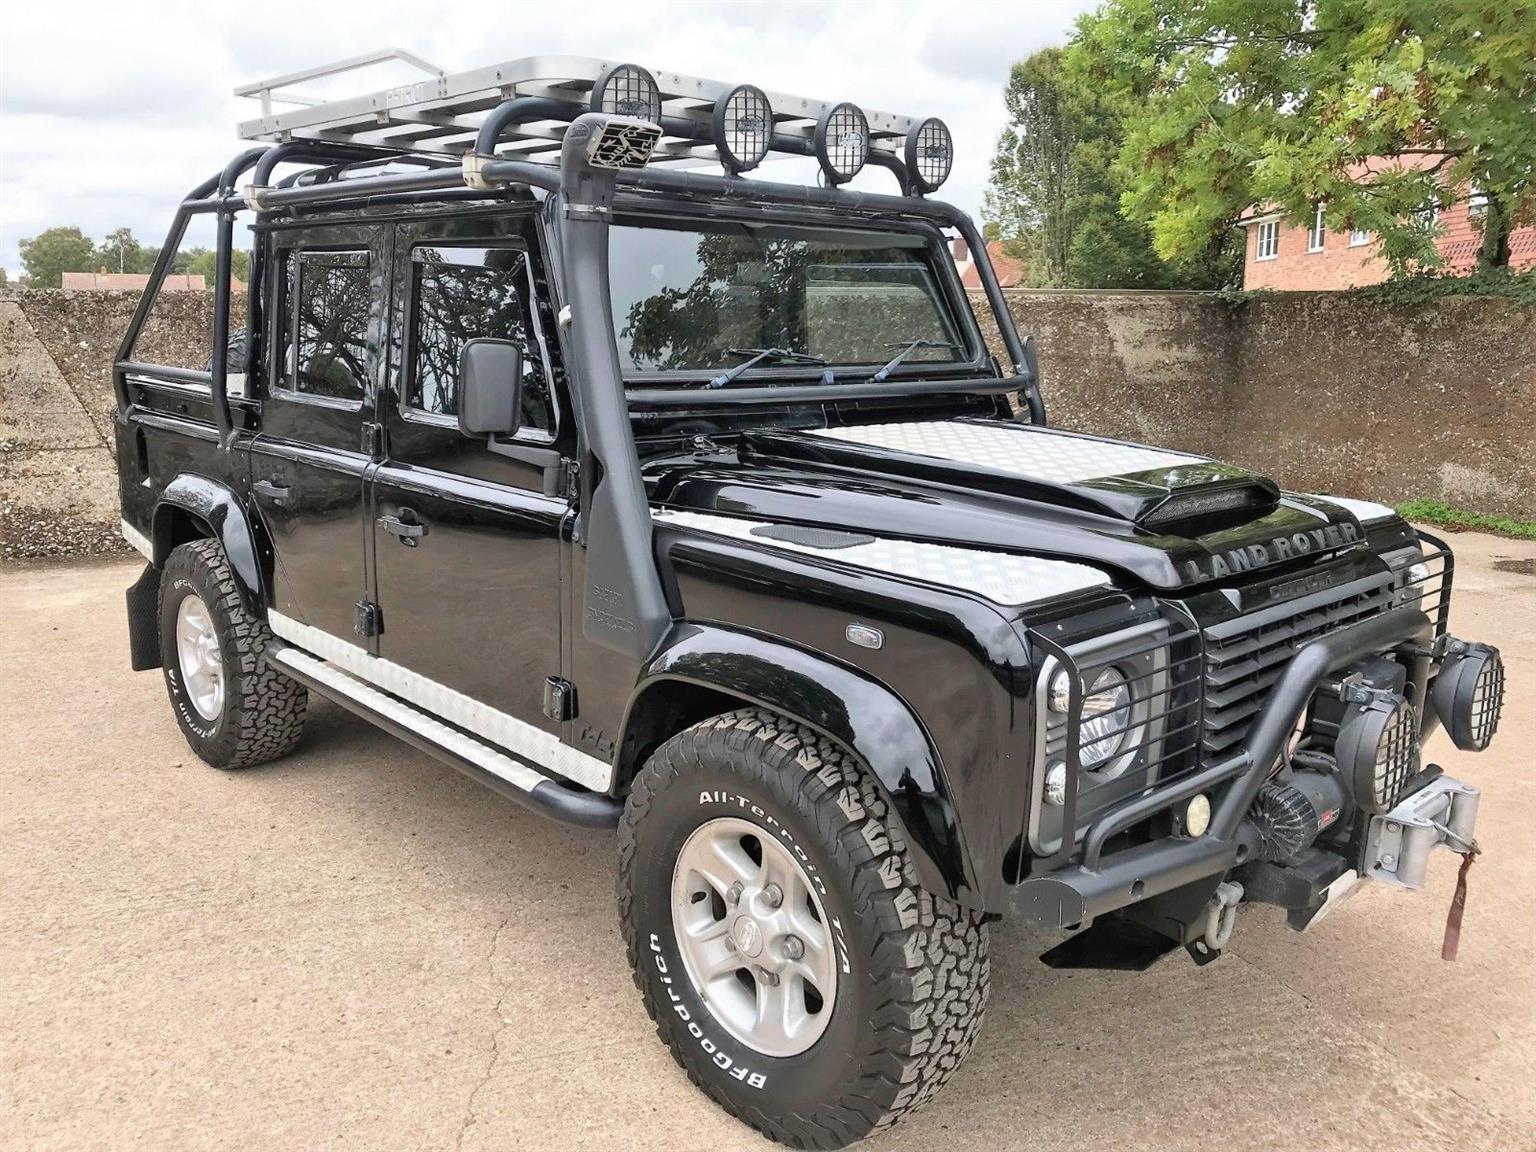 Land Rover Defender Td5 Immobiliser Problems - ▷ ▷ PowerMall